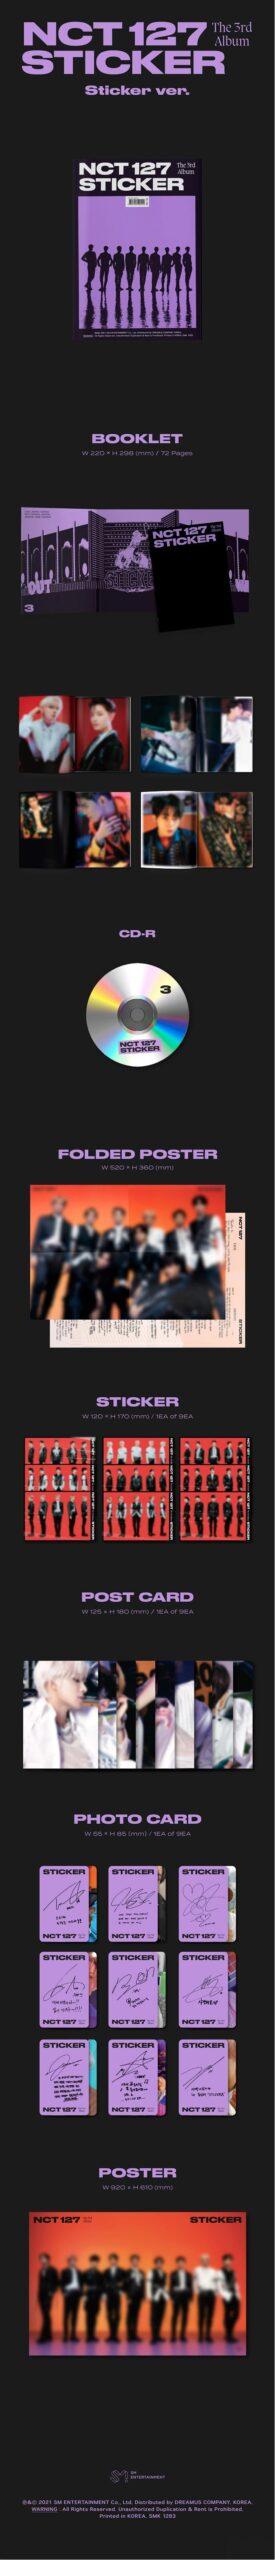 3rd Album de NCT127 Sticker Sticker Ver. 1.1